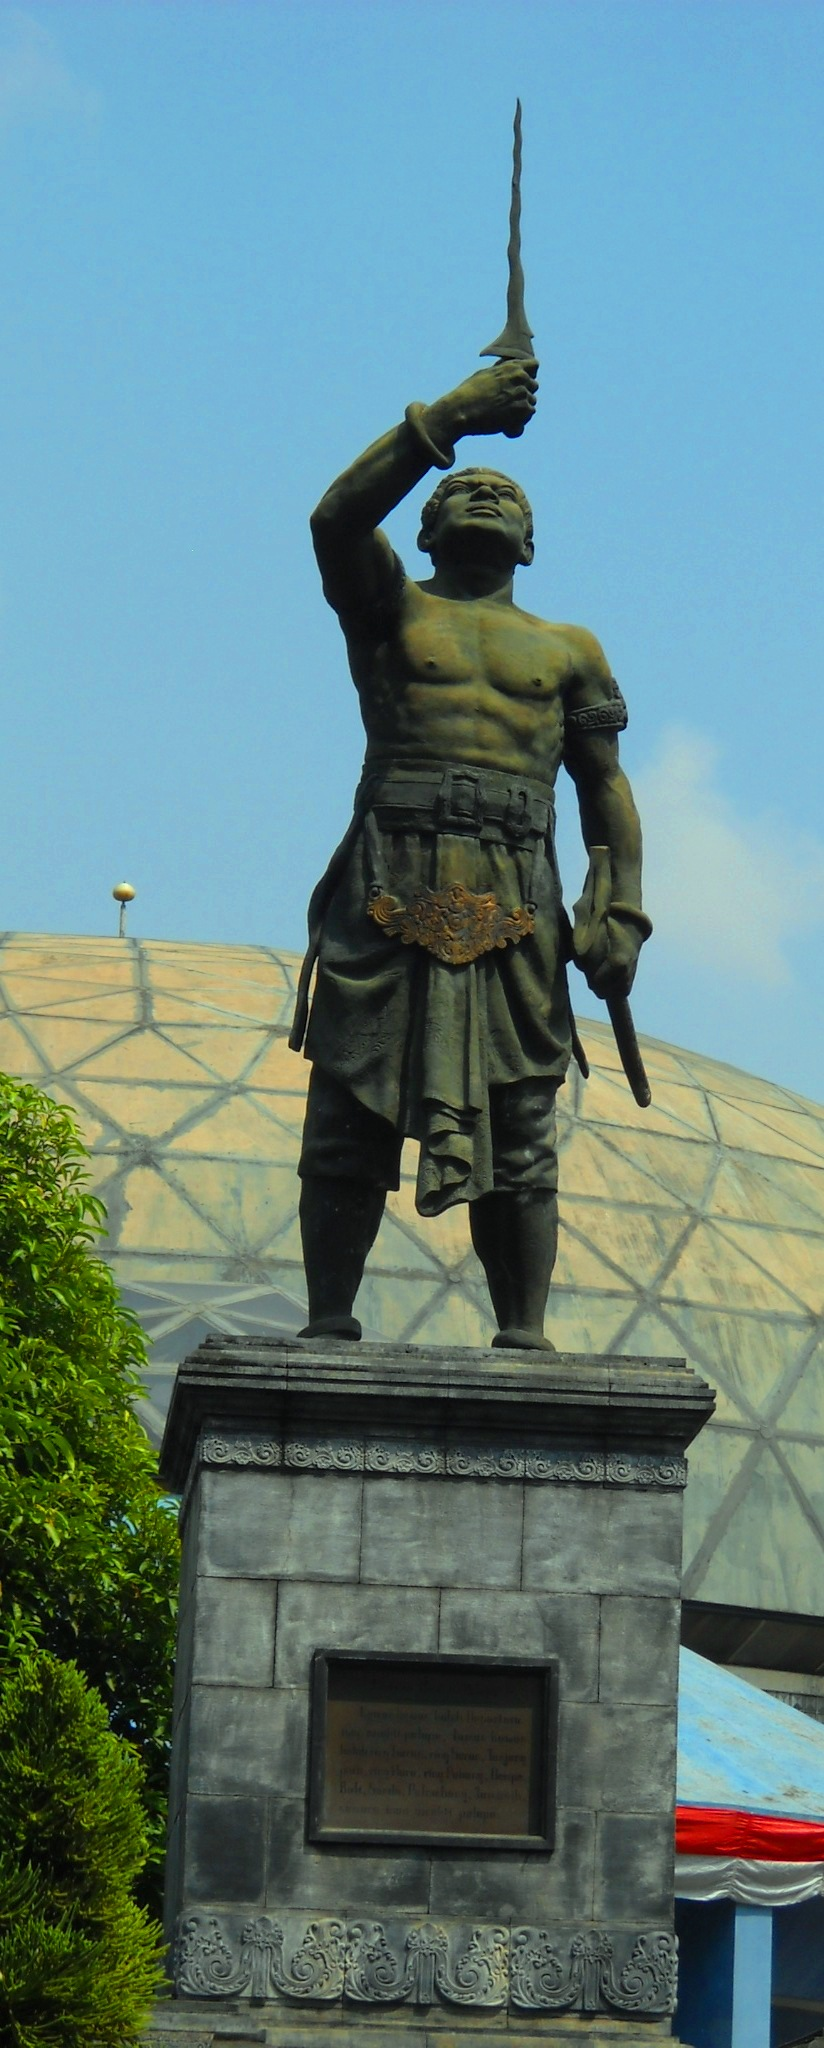 English: Gajah Mada statue in front of Telecom...